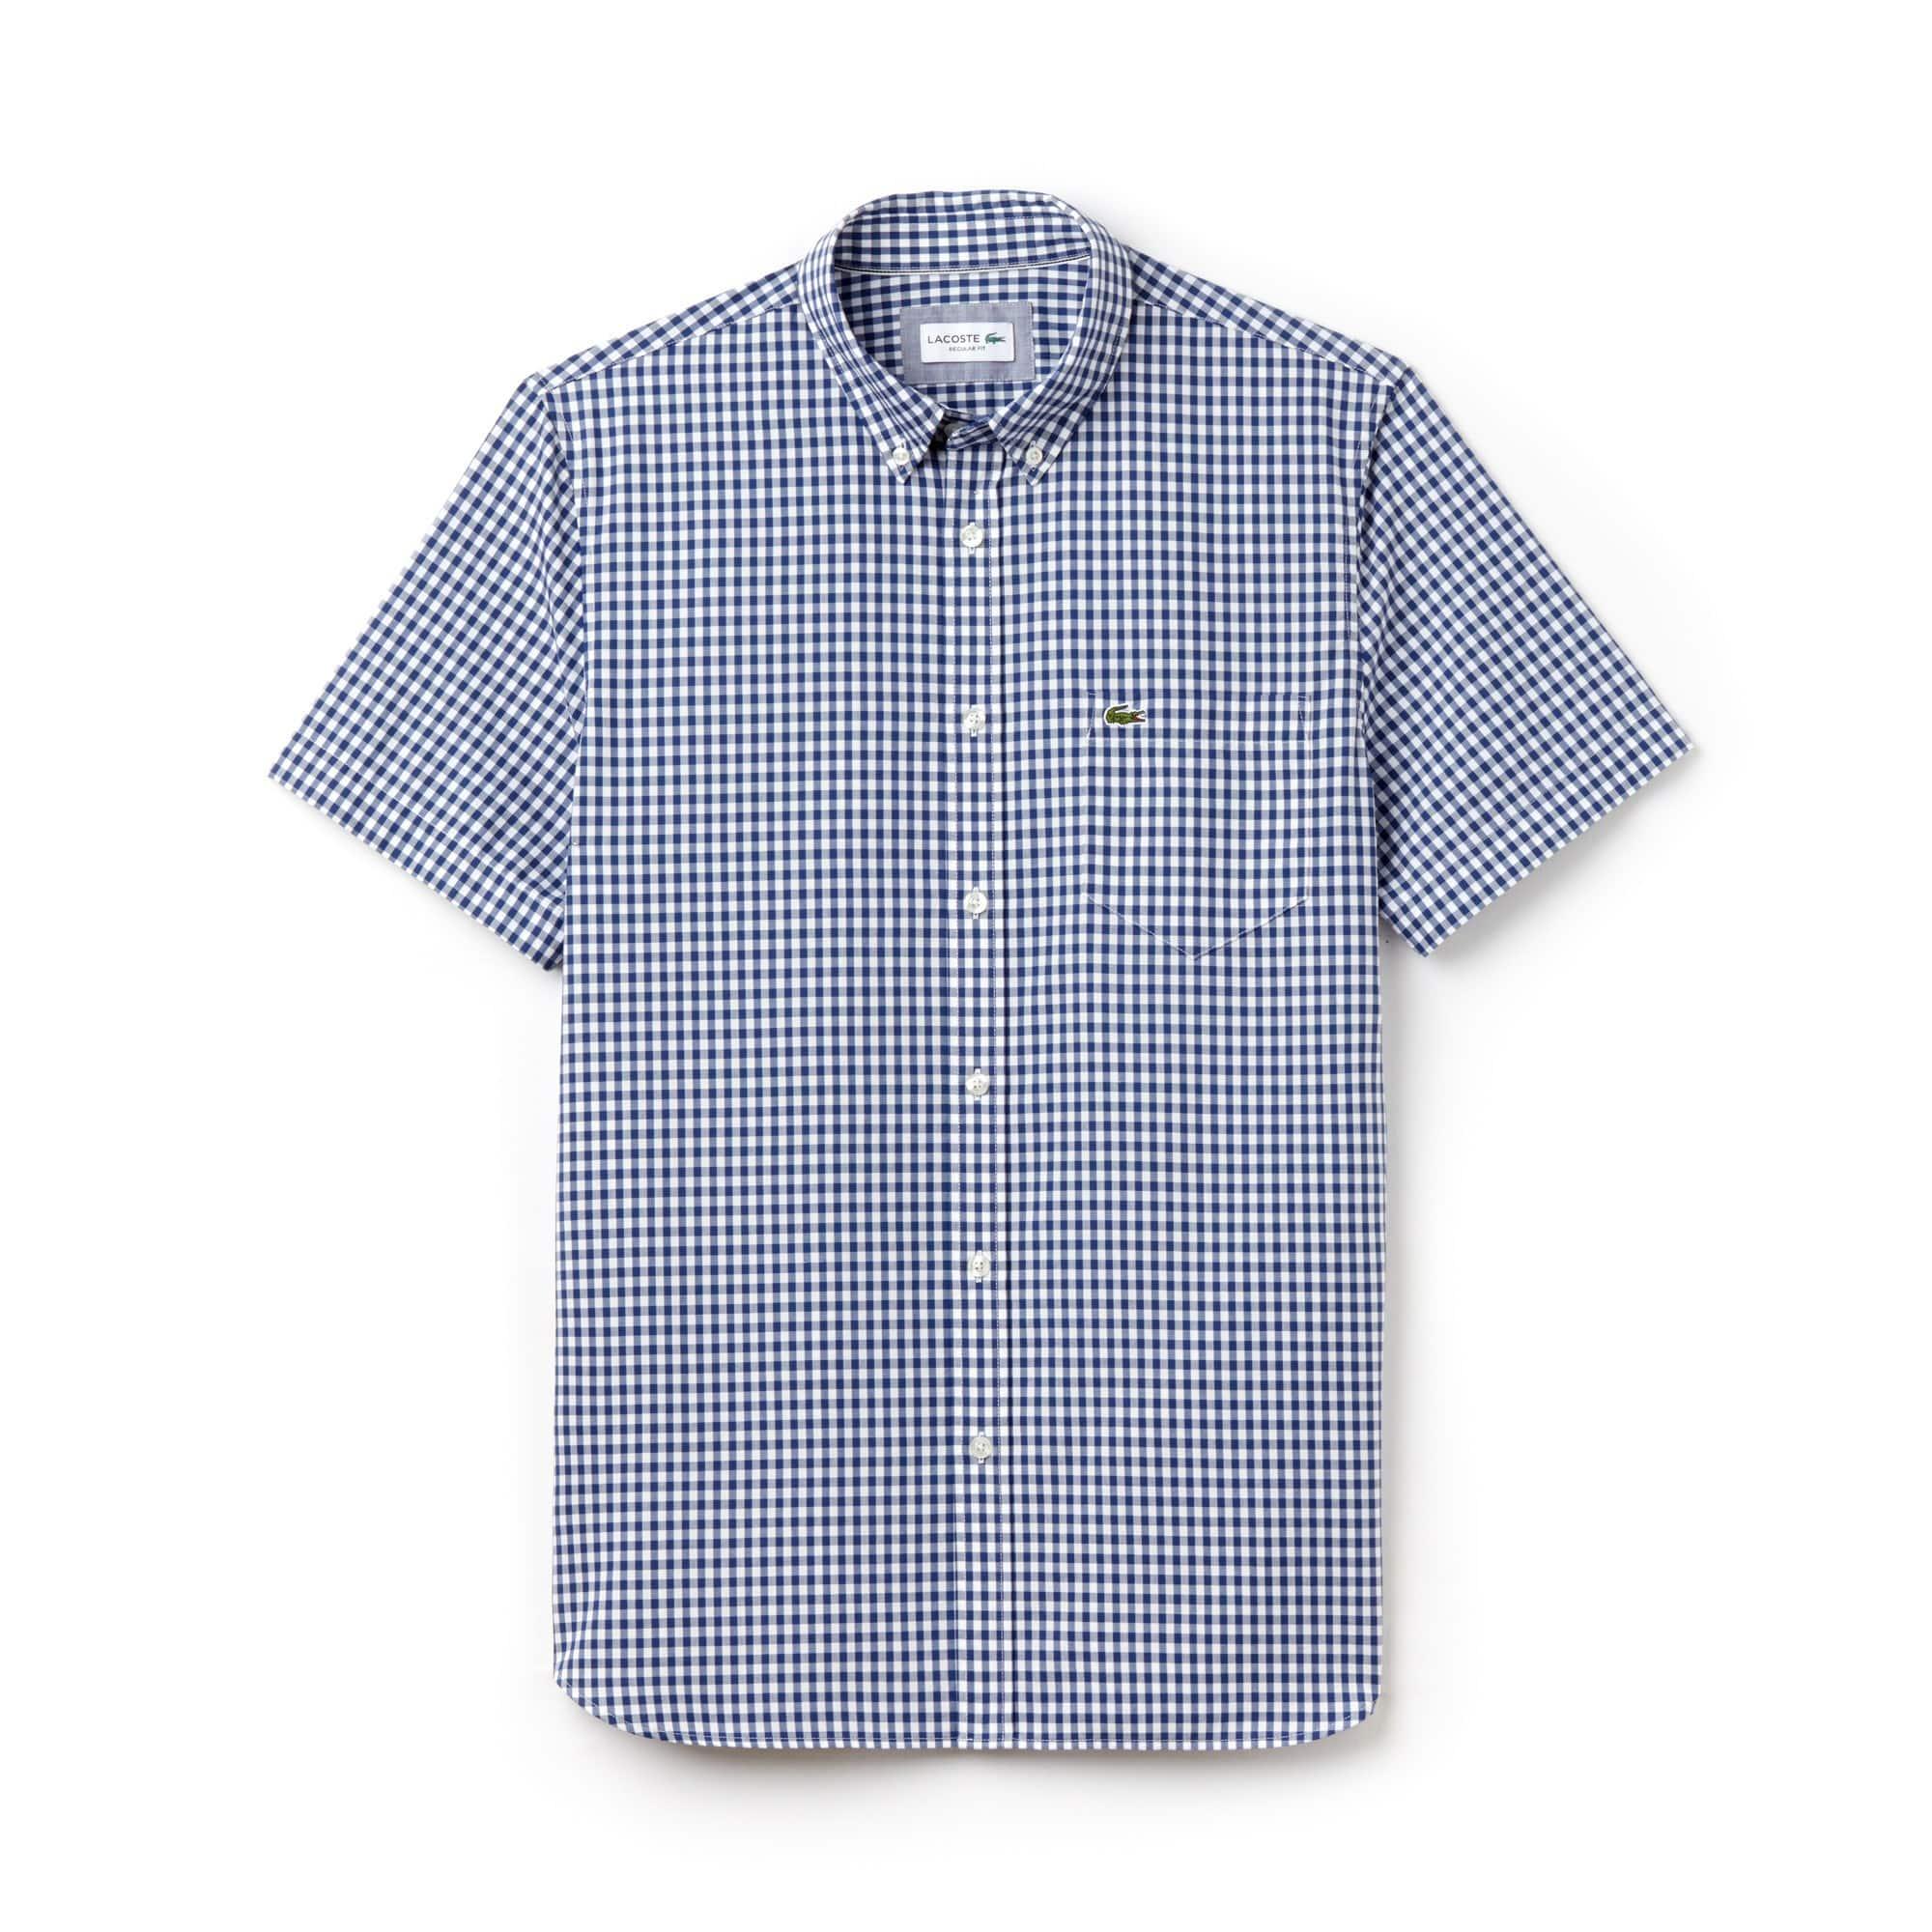 Camicia regular fit a maniche corte in popeline a quadretti vichy